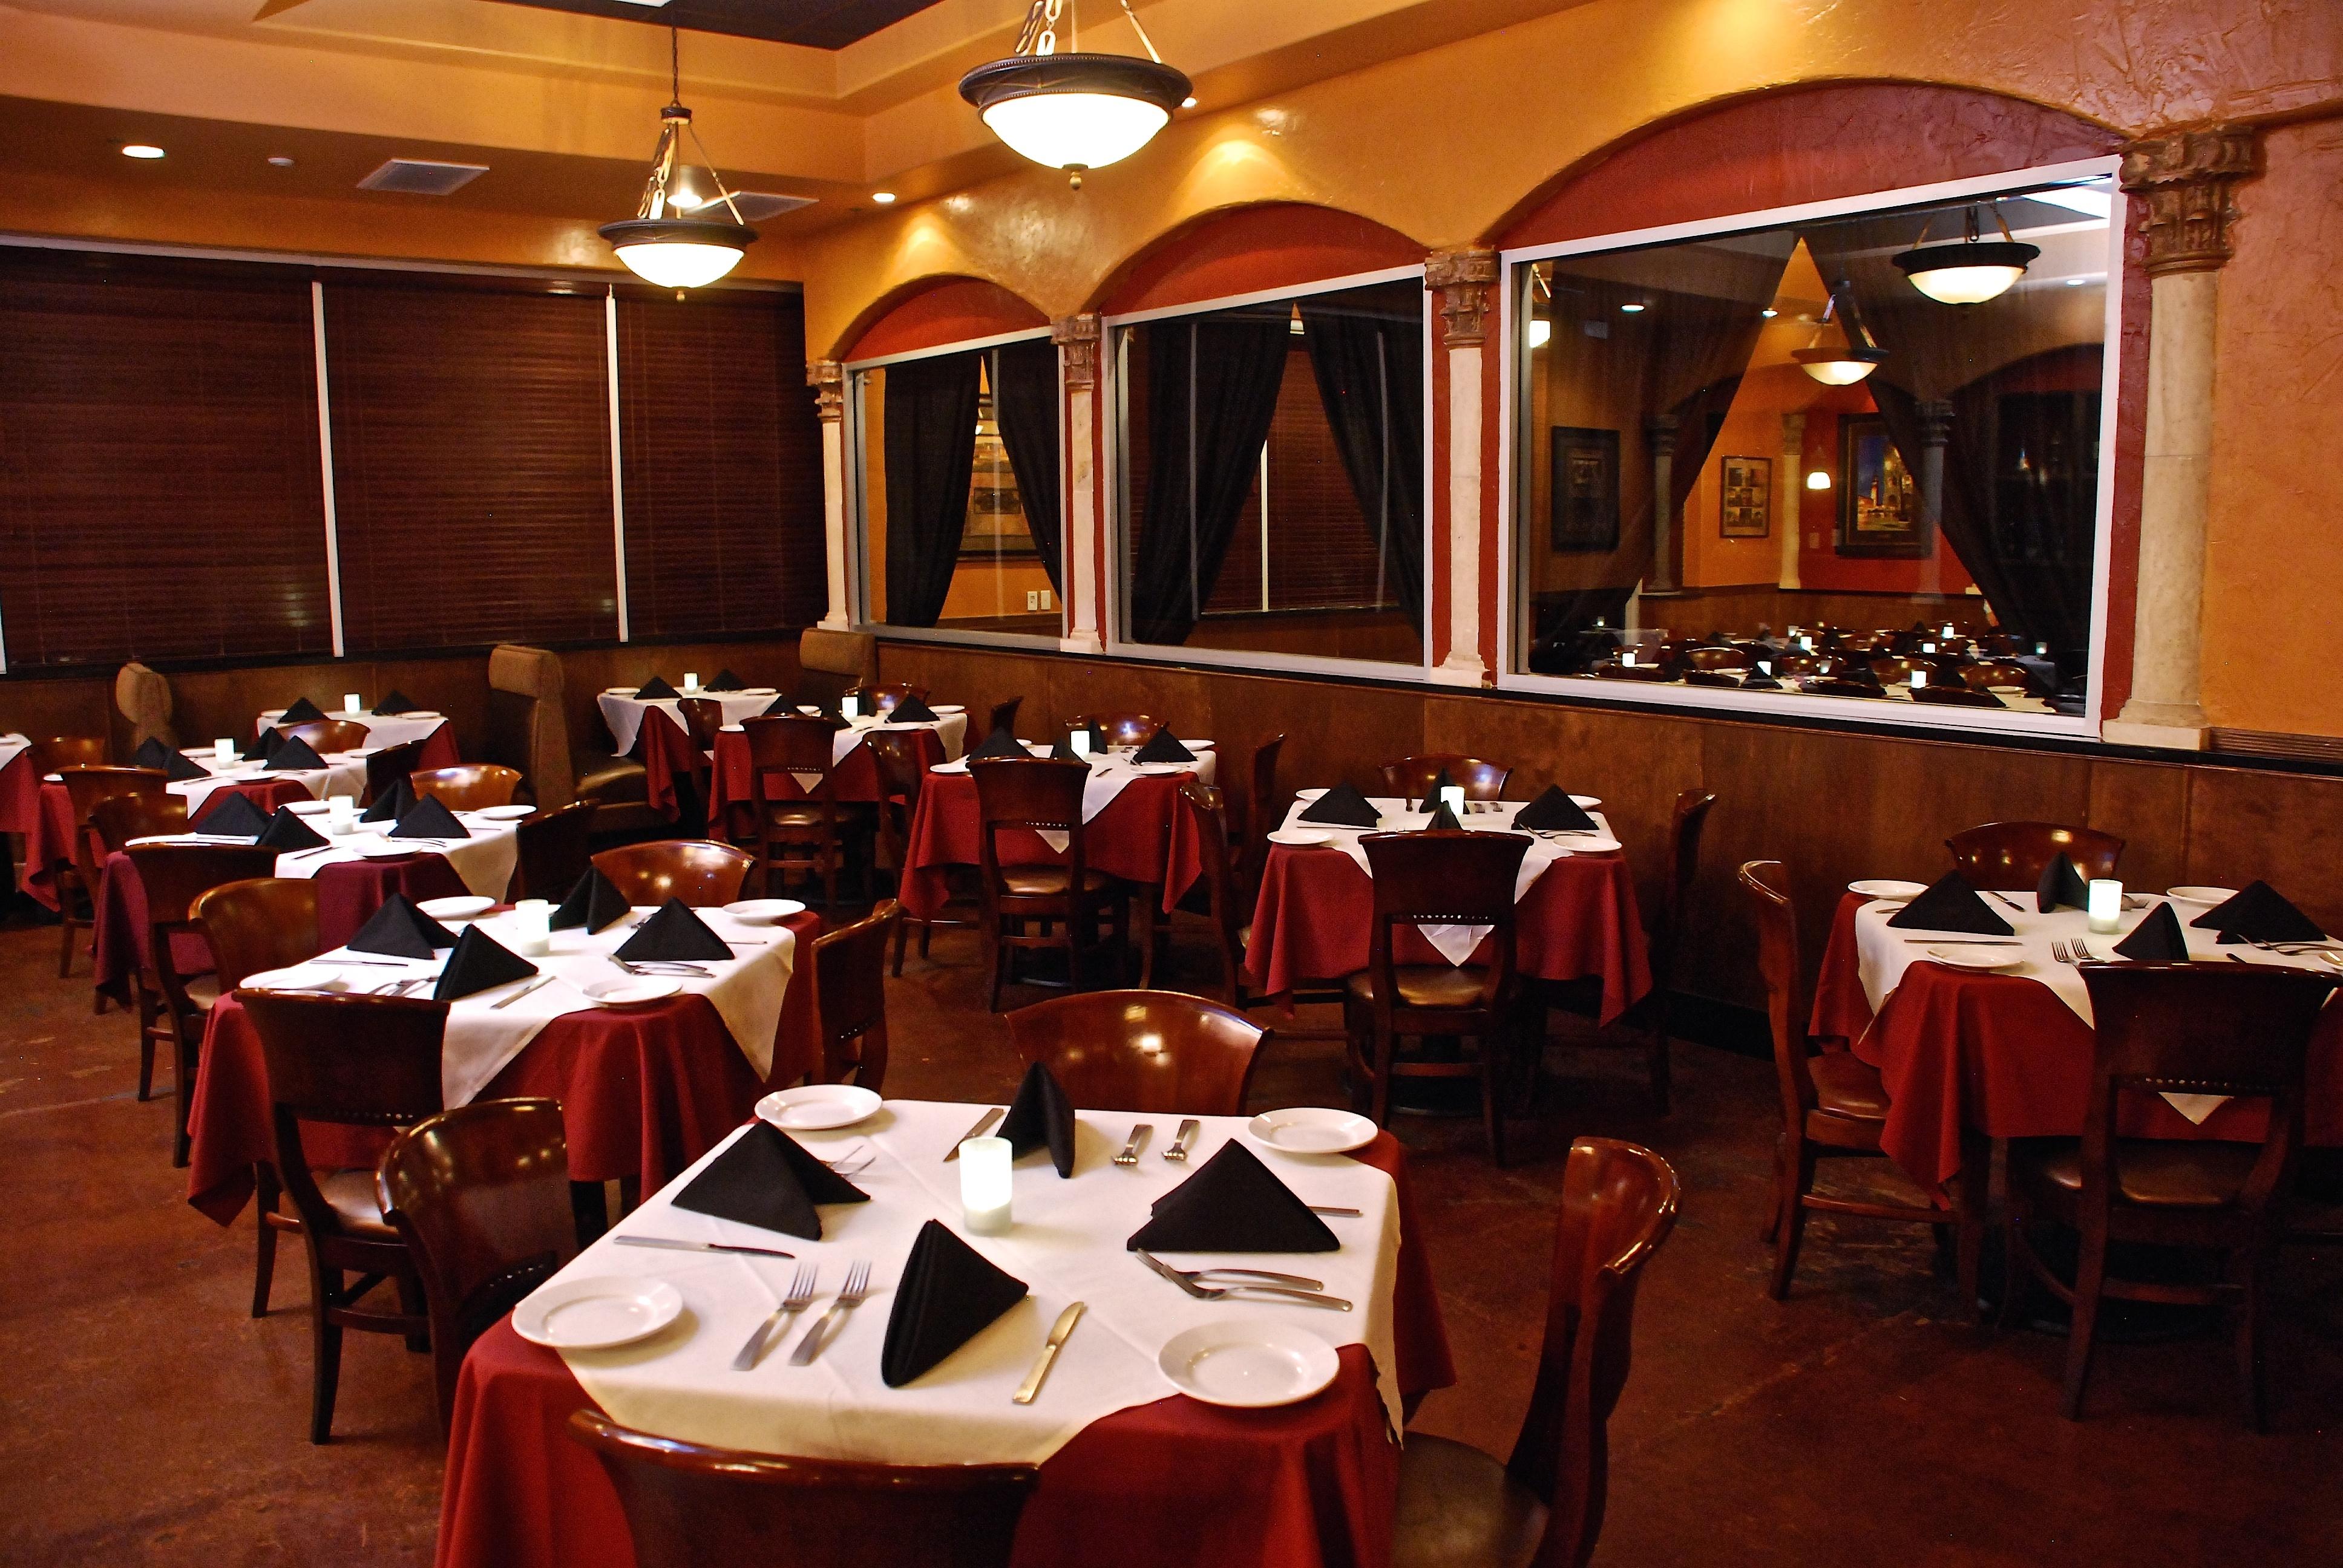 San Antonio Restaurant Coupons Best Buy Seagate